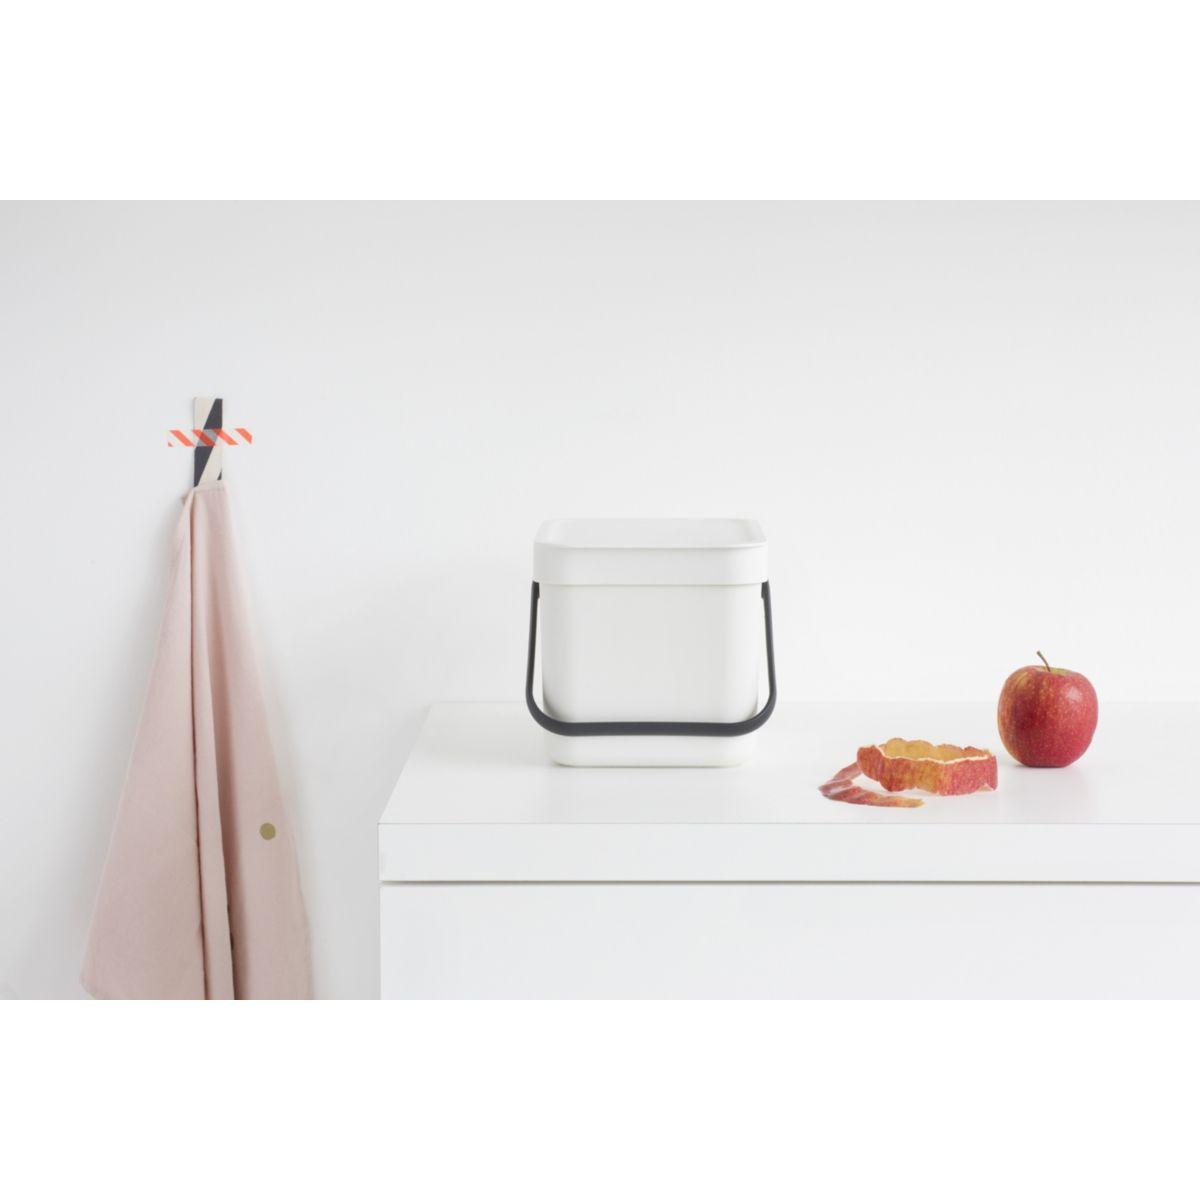 Poubelle manuelle BRABANTIA Waste Bin Sort & Go 6L White (photo)